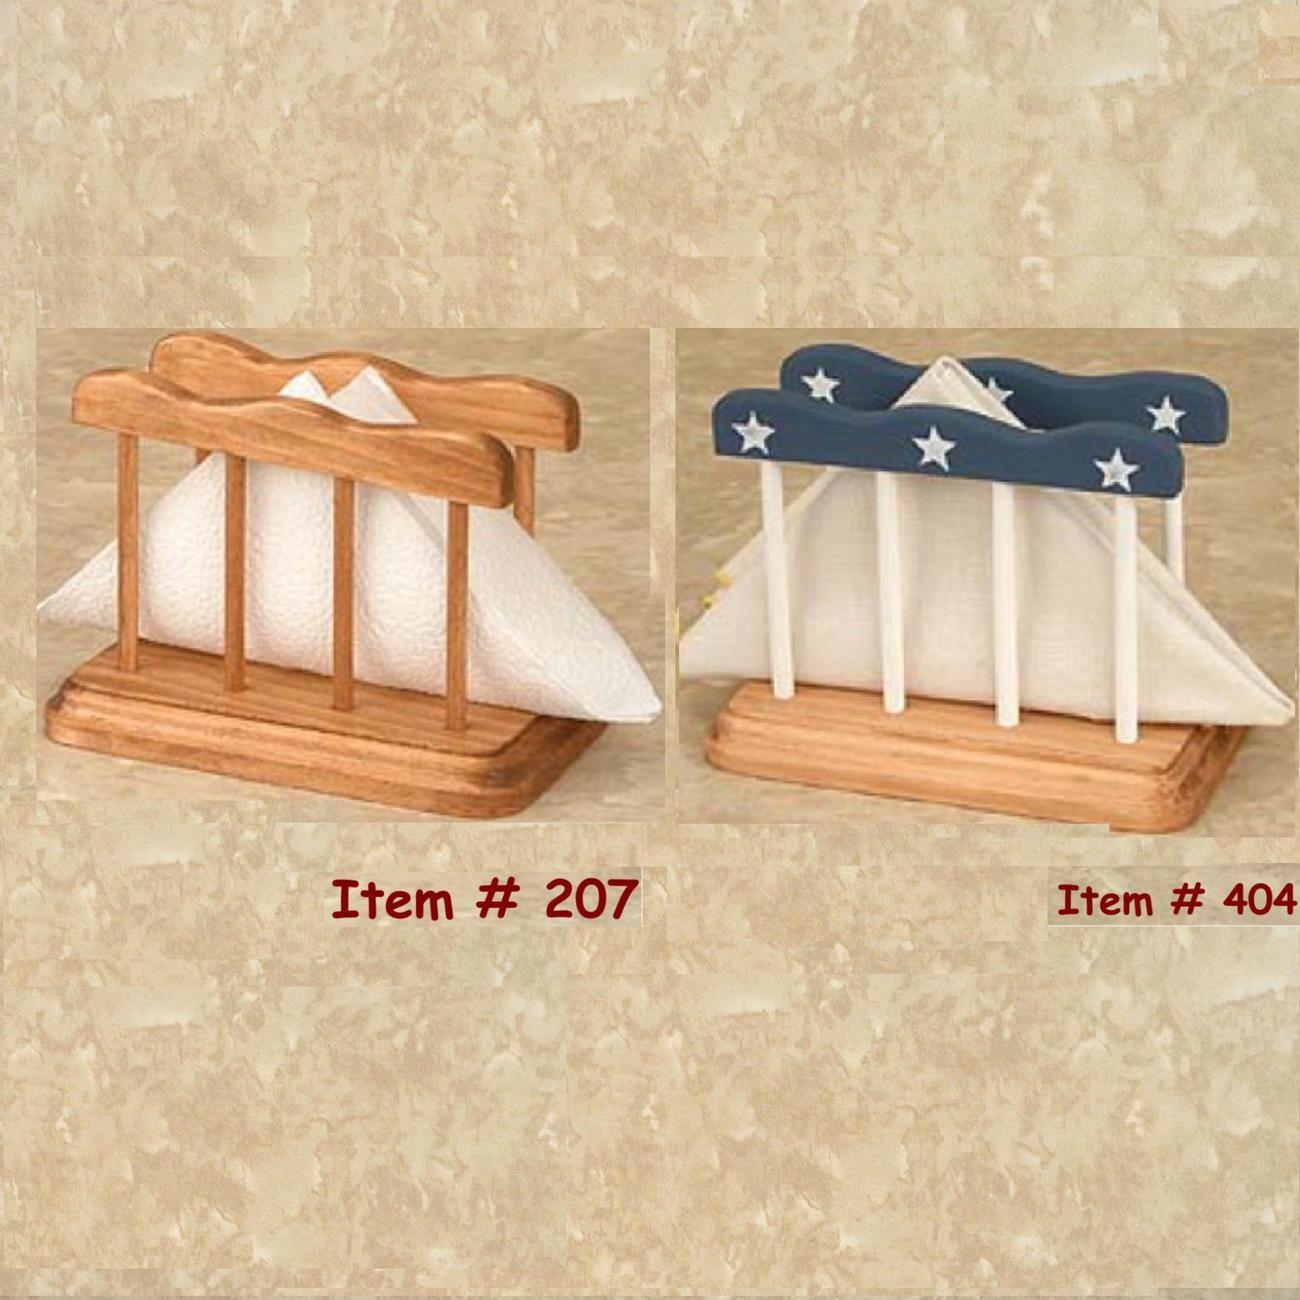 Message Center - Wood Letter Holders